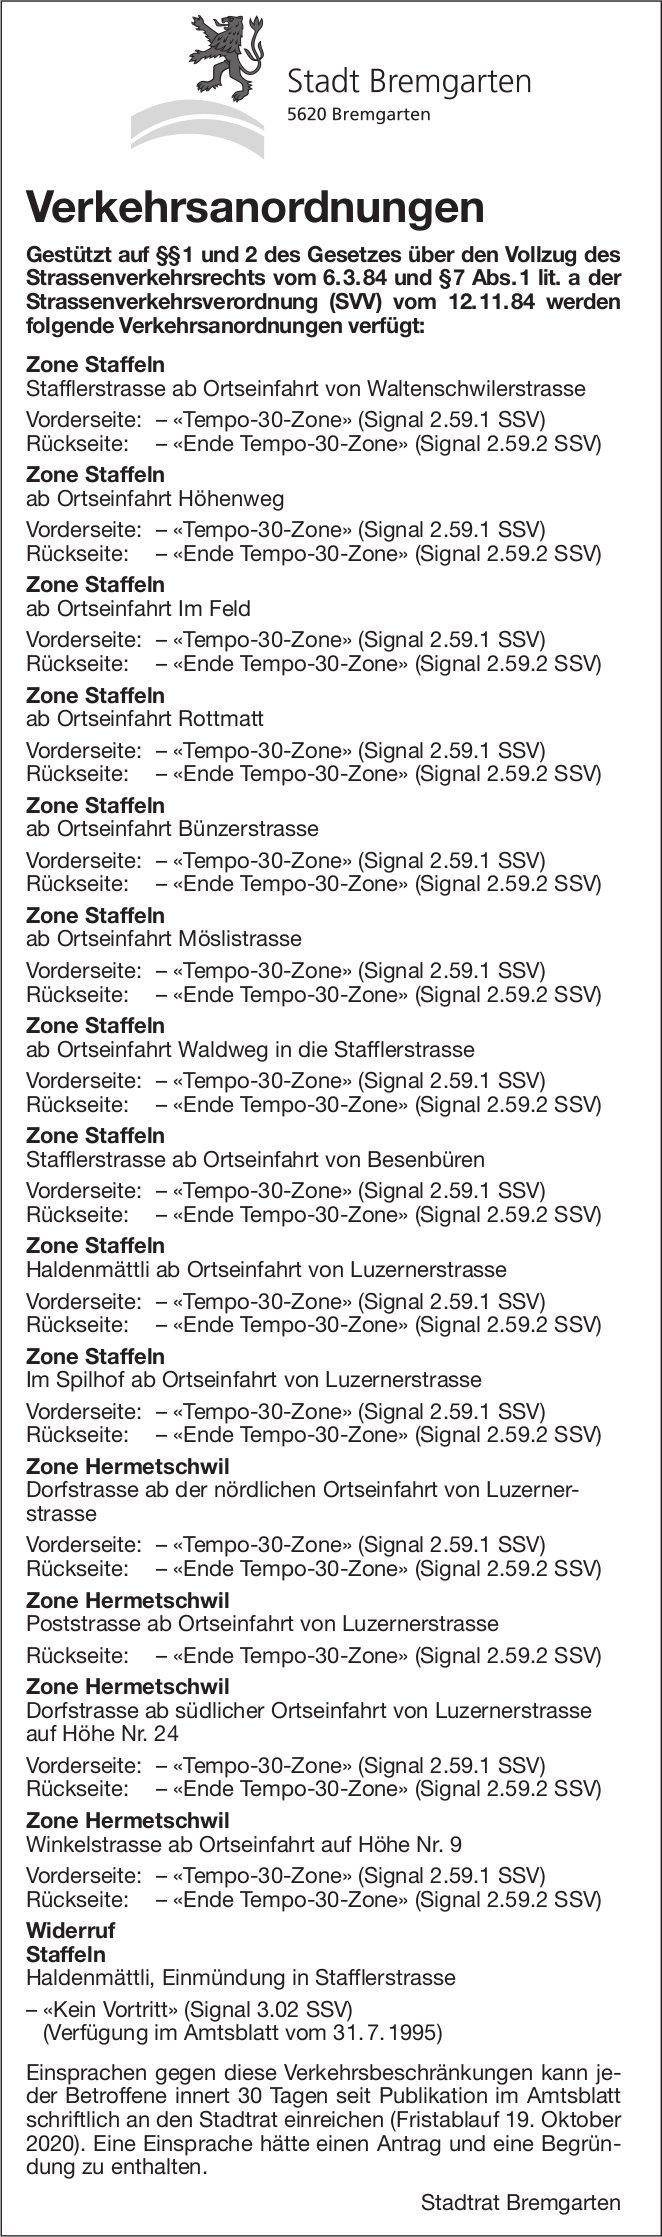 Stadt Bremgarten - Verkehrsanordnungen